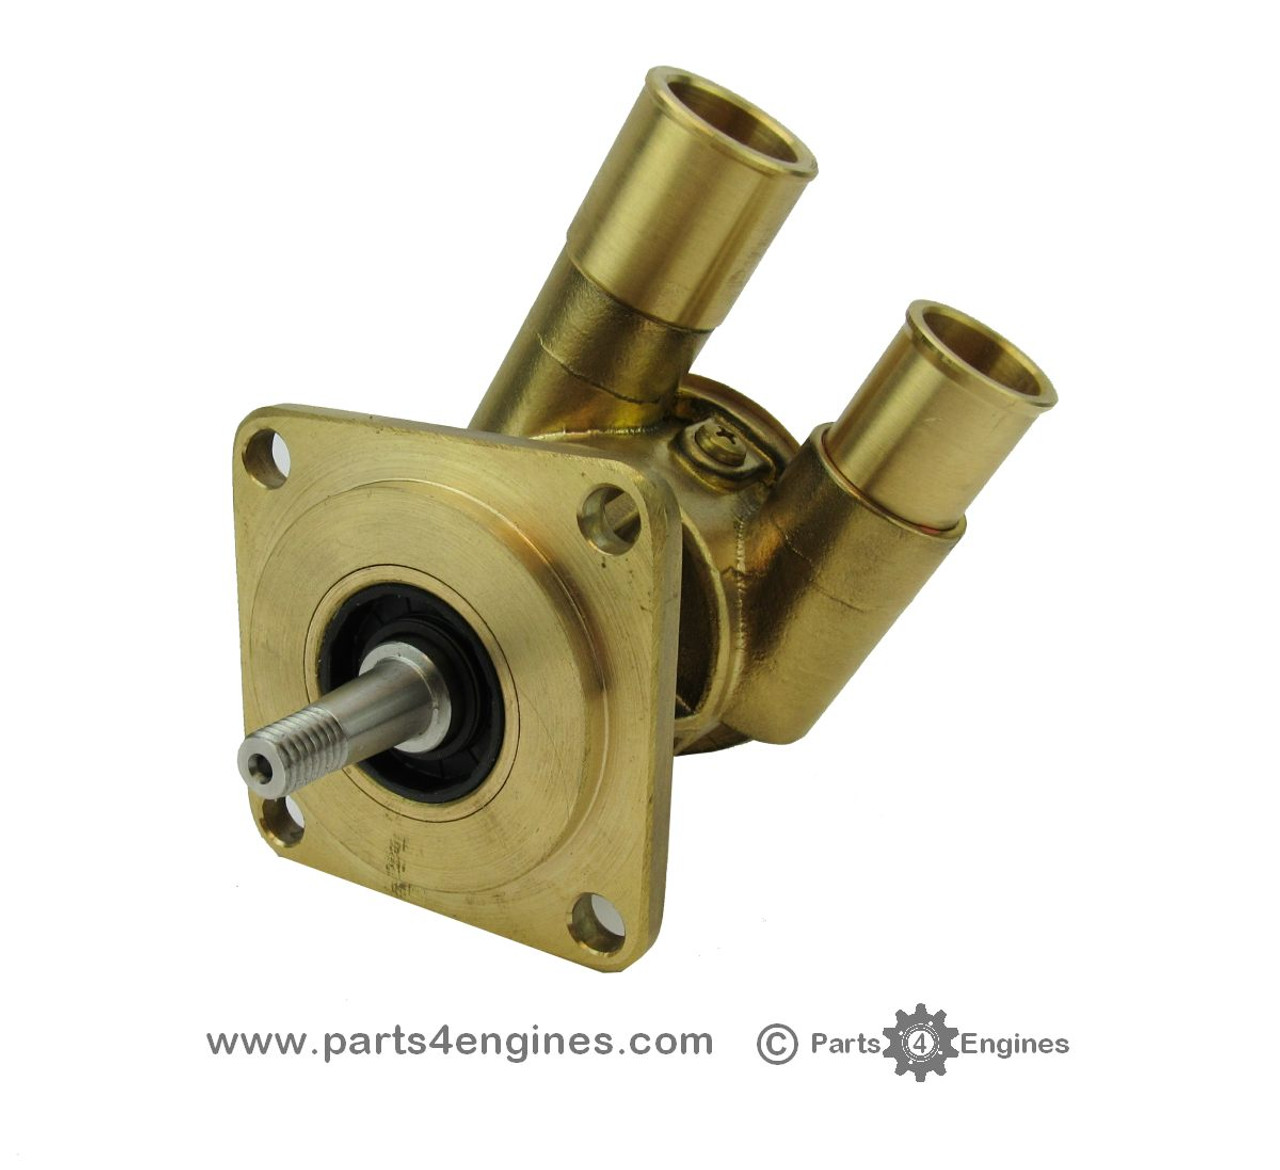 Volvo Penta D2-55 Raw Water Pump - parts4engines.com